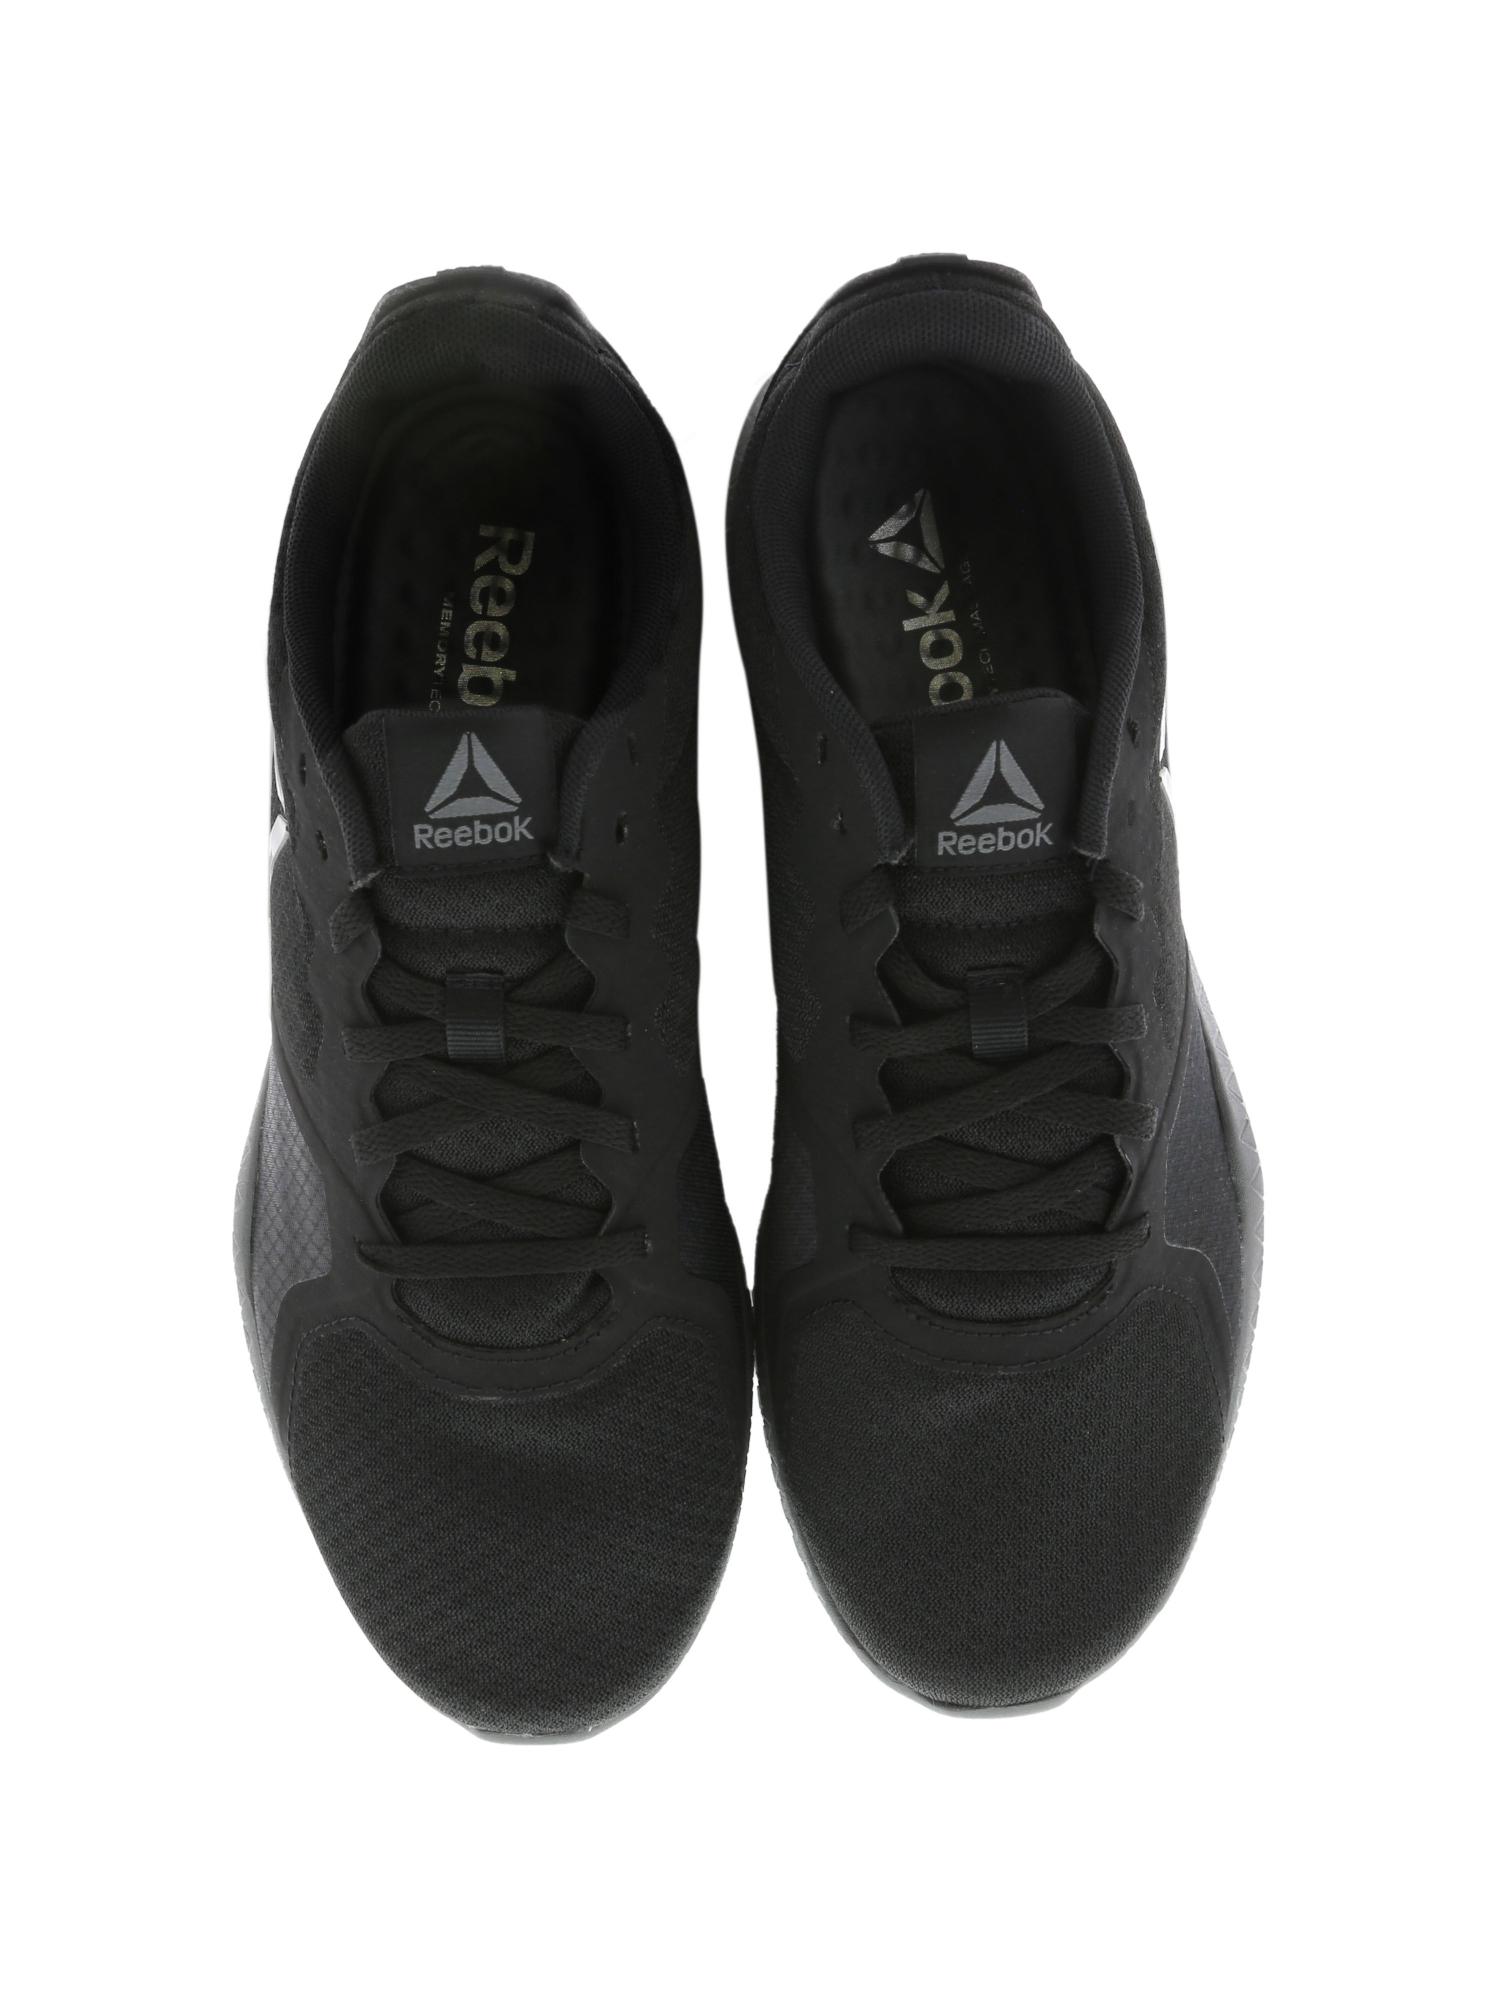 Reebok-Men-039-s-Flexagon-Force-Ankle-High-Training-Shoes thumbnail 8